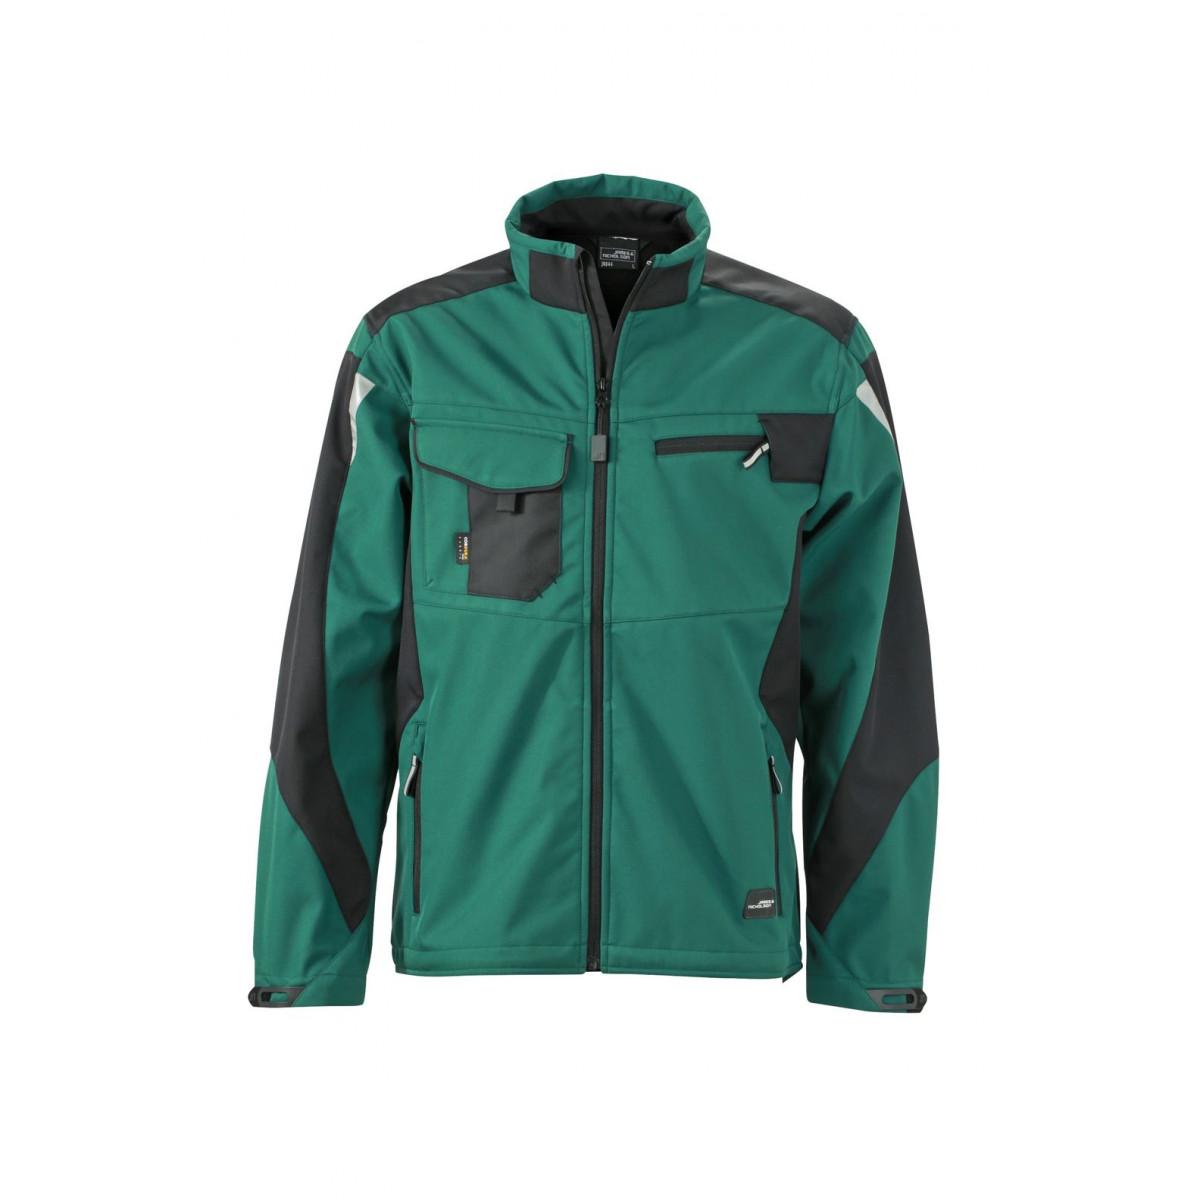 Куртка мужская JN844 Workwear Softshell Jacket - Темно-зеленый/Черный